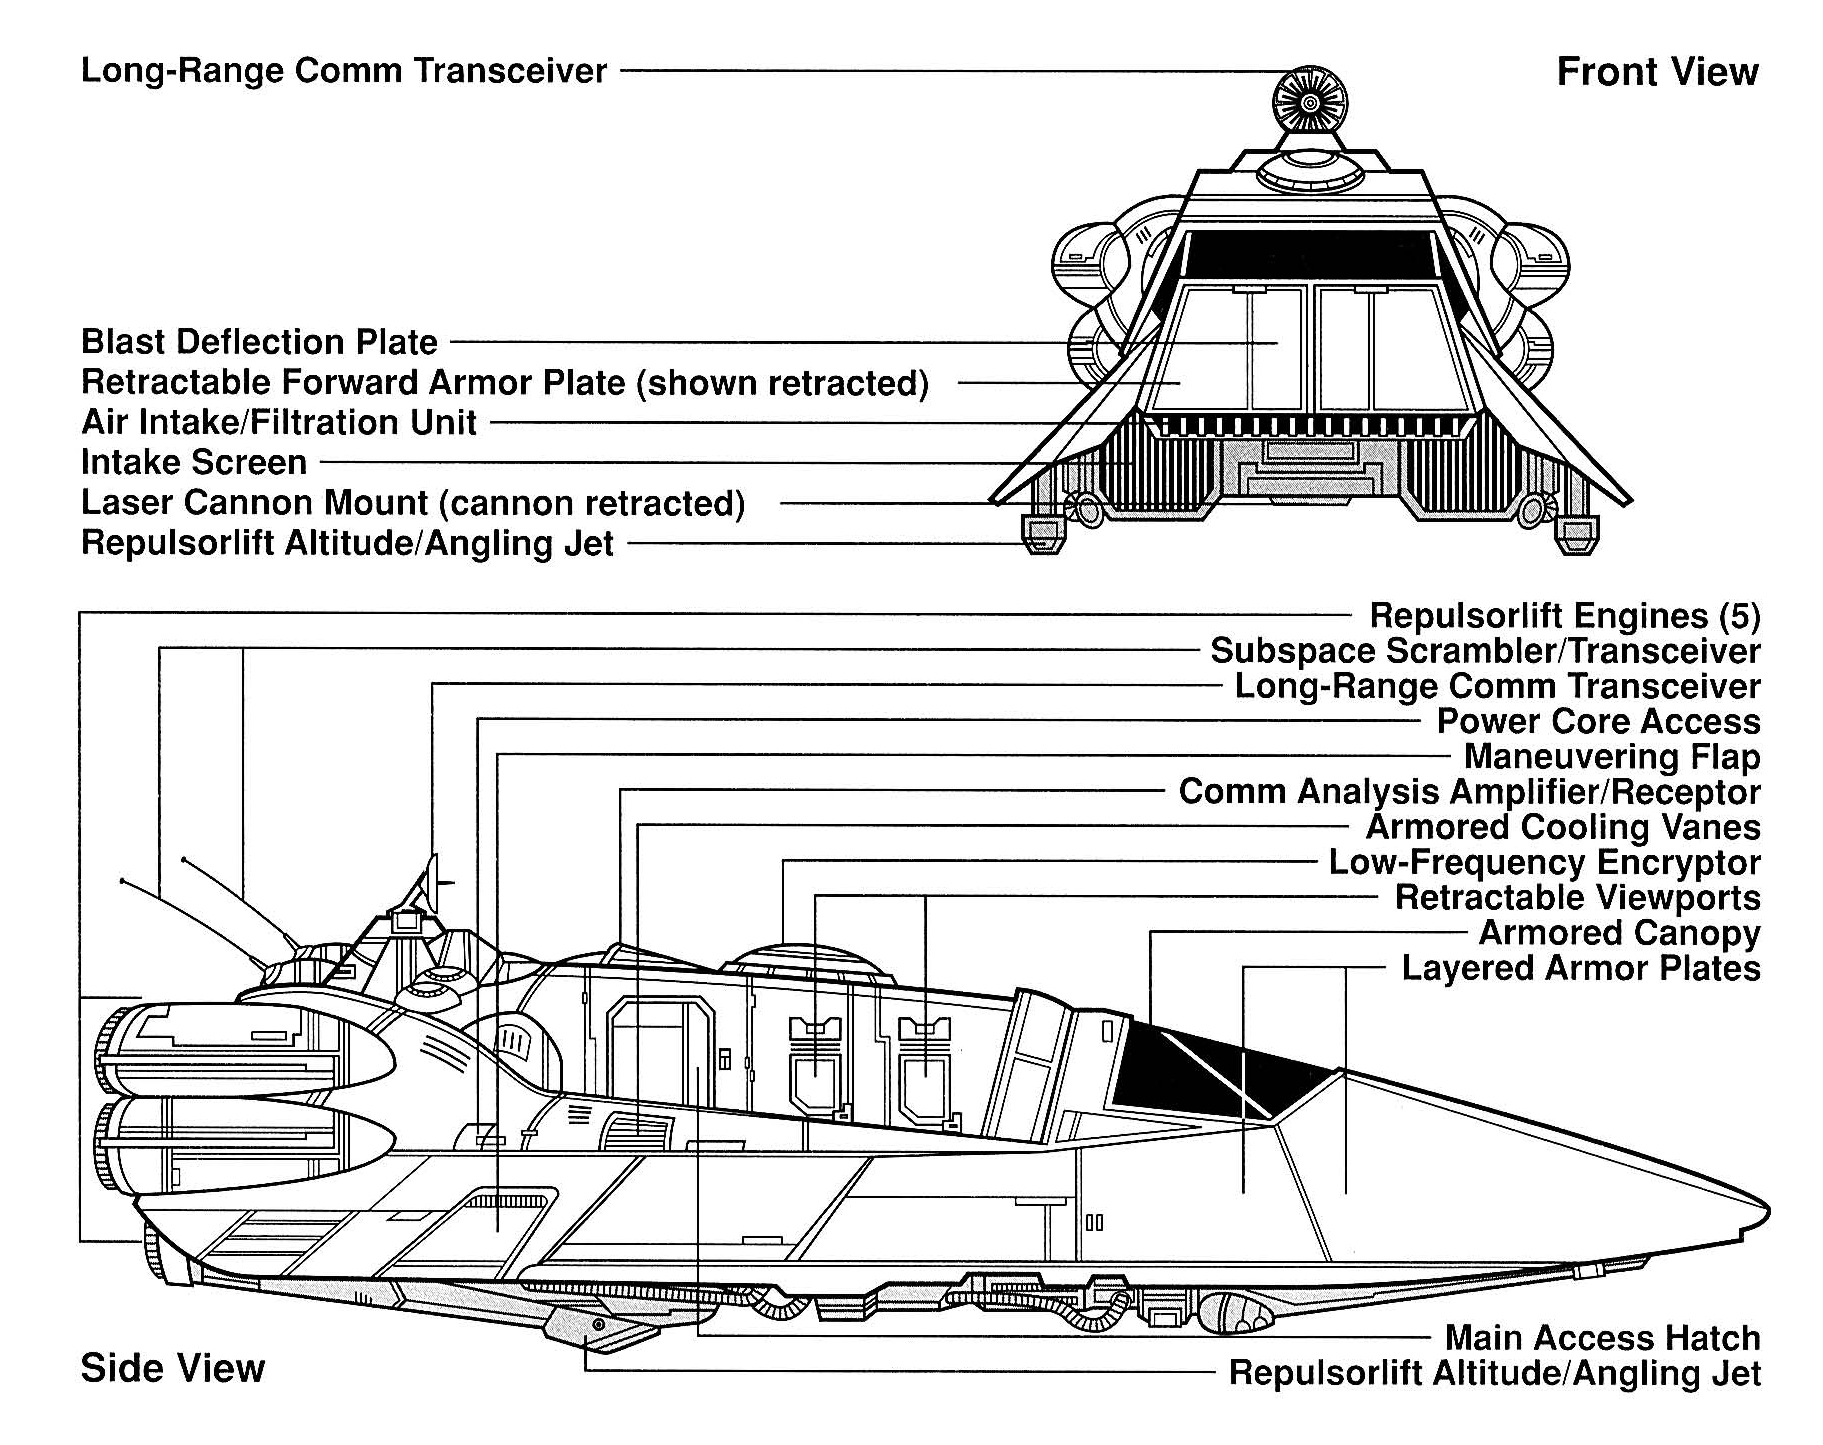 ChariotLAV schem.jpg